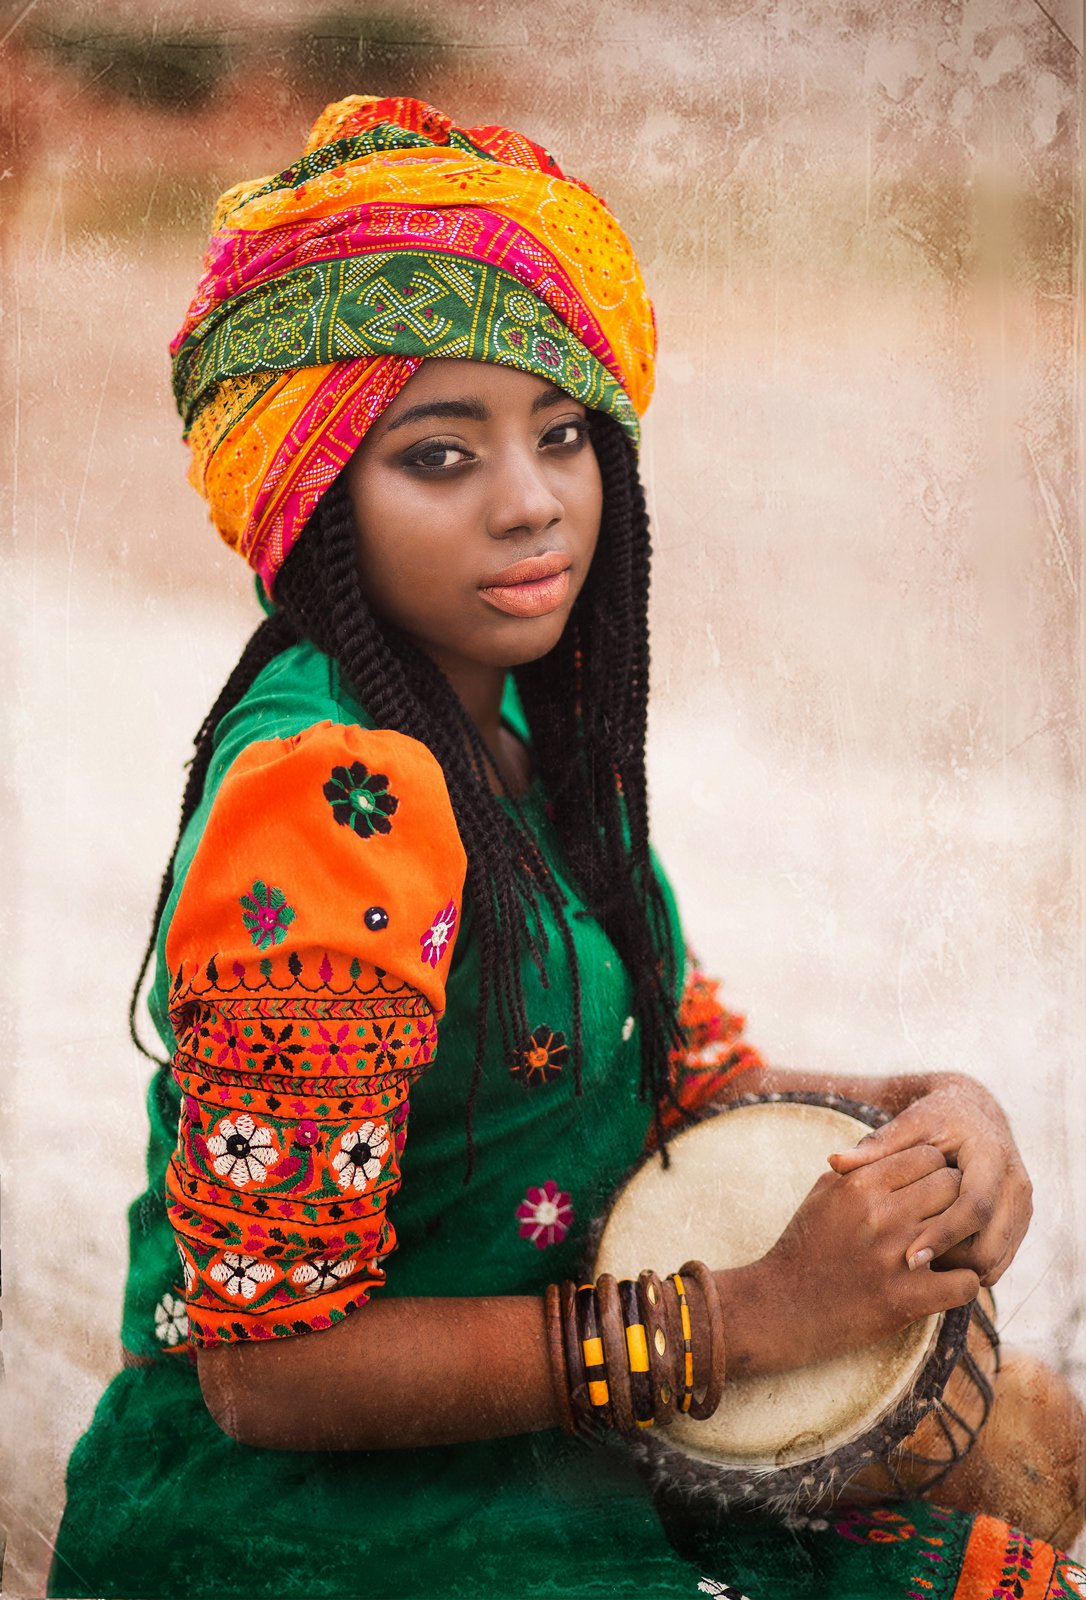 африканка, африка, девушка, барабаны, красавица, чернокожая, Биличенко Оксана